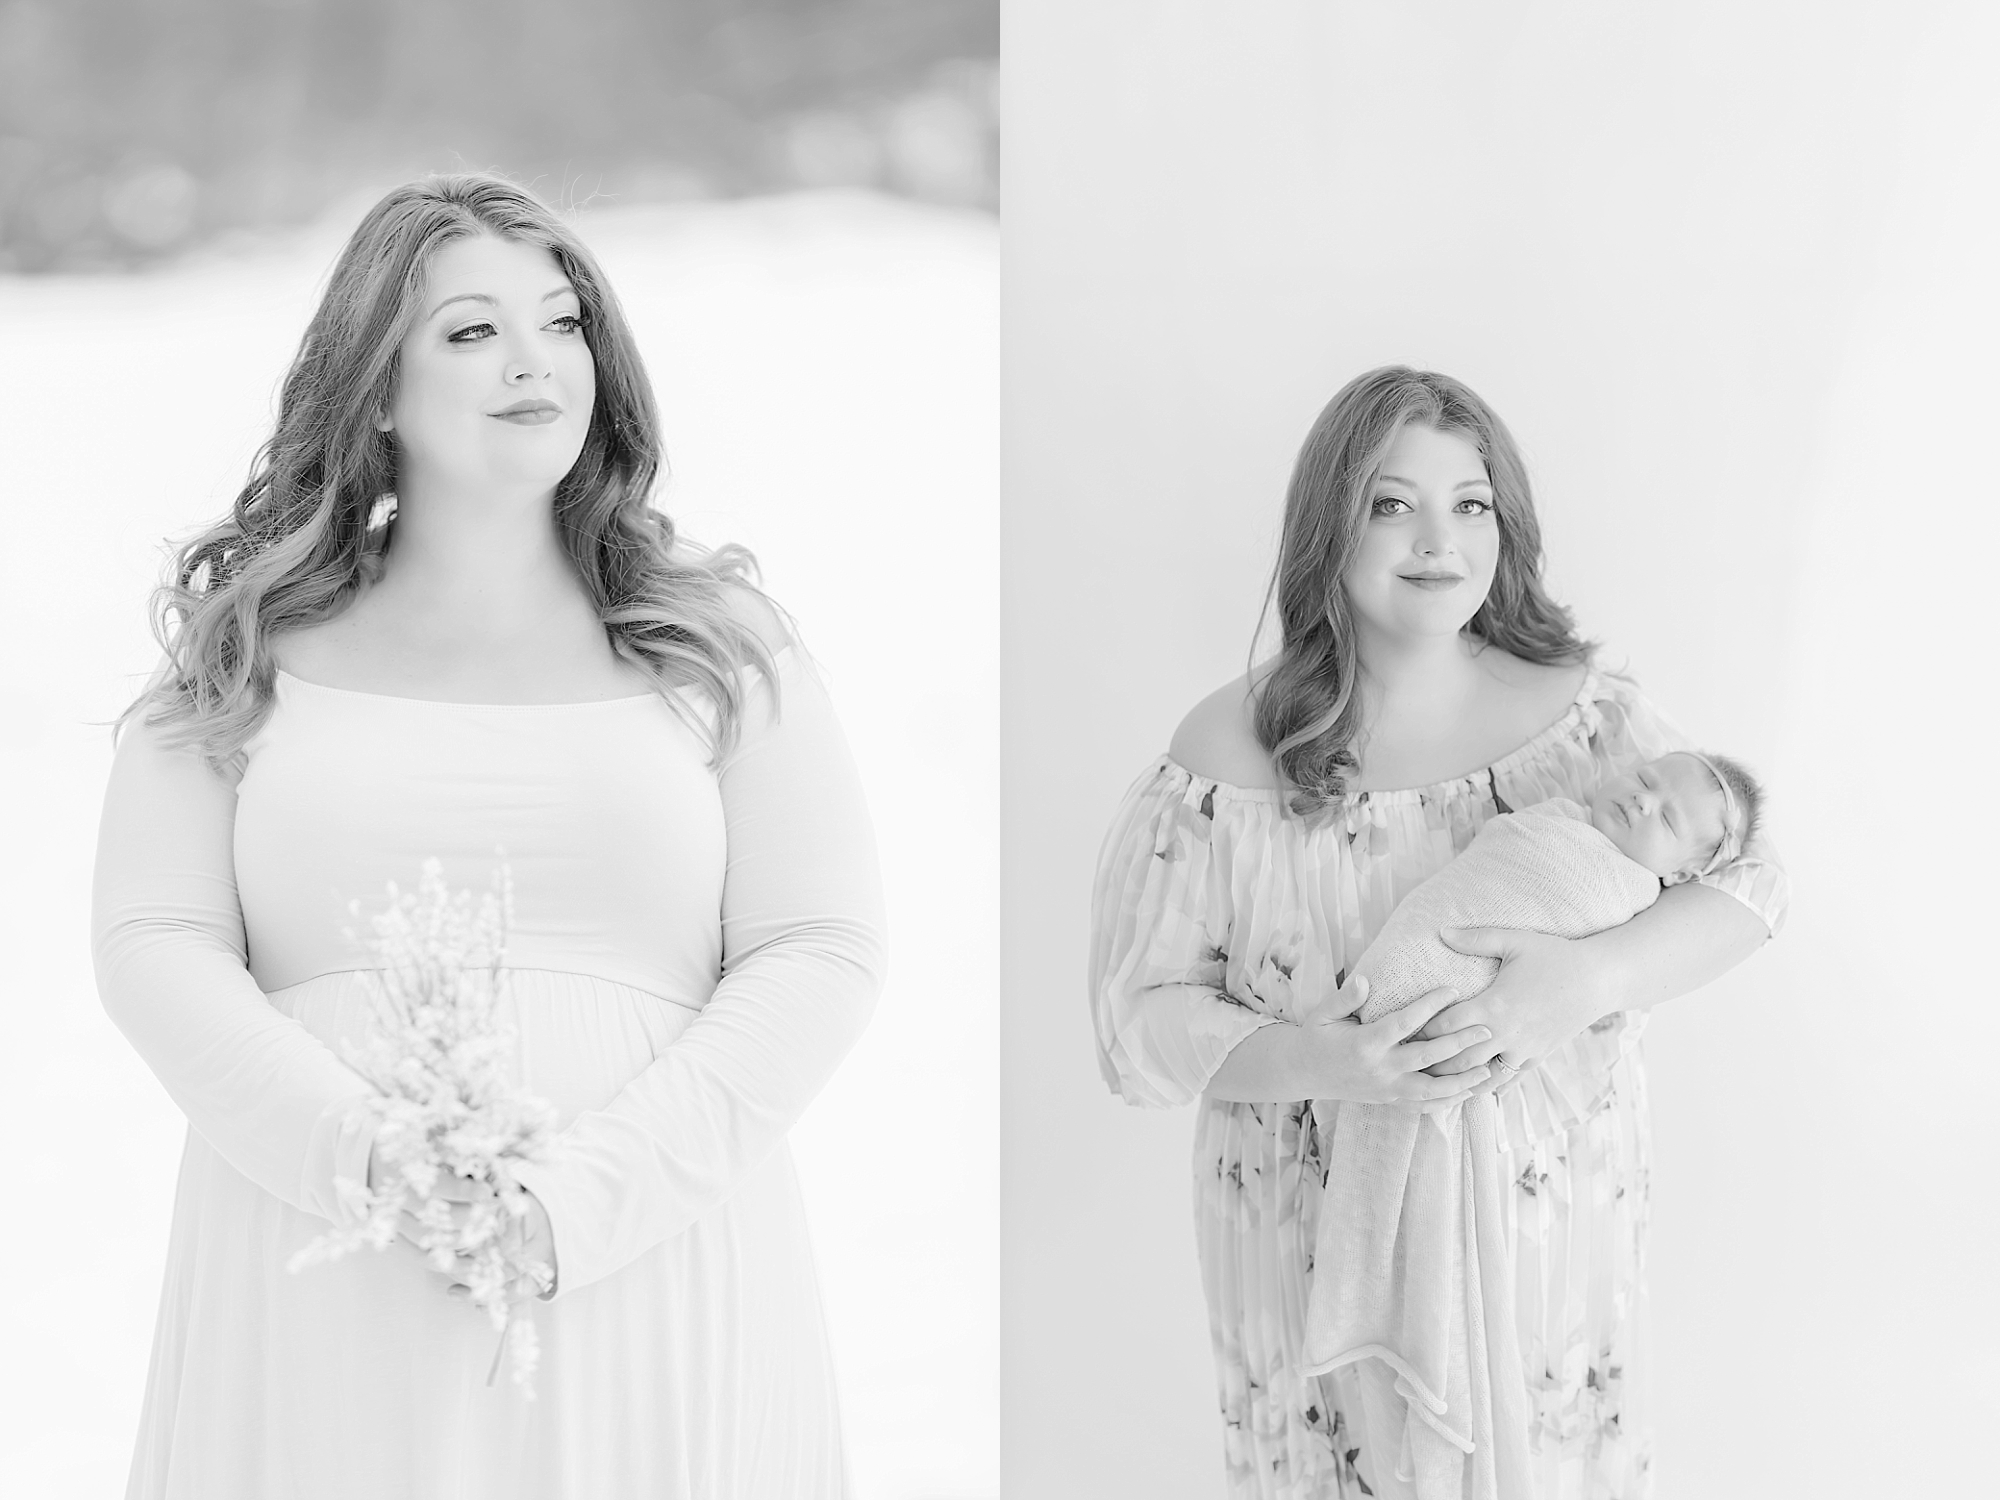 Pittsburgh PA Newborn and Maternity Photography